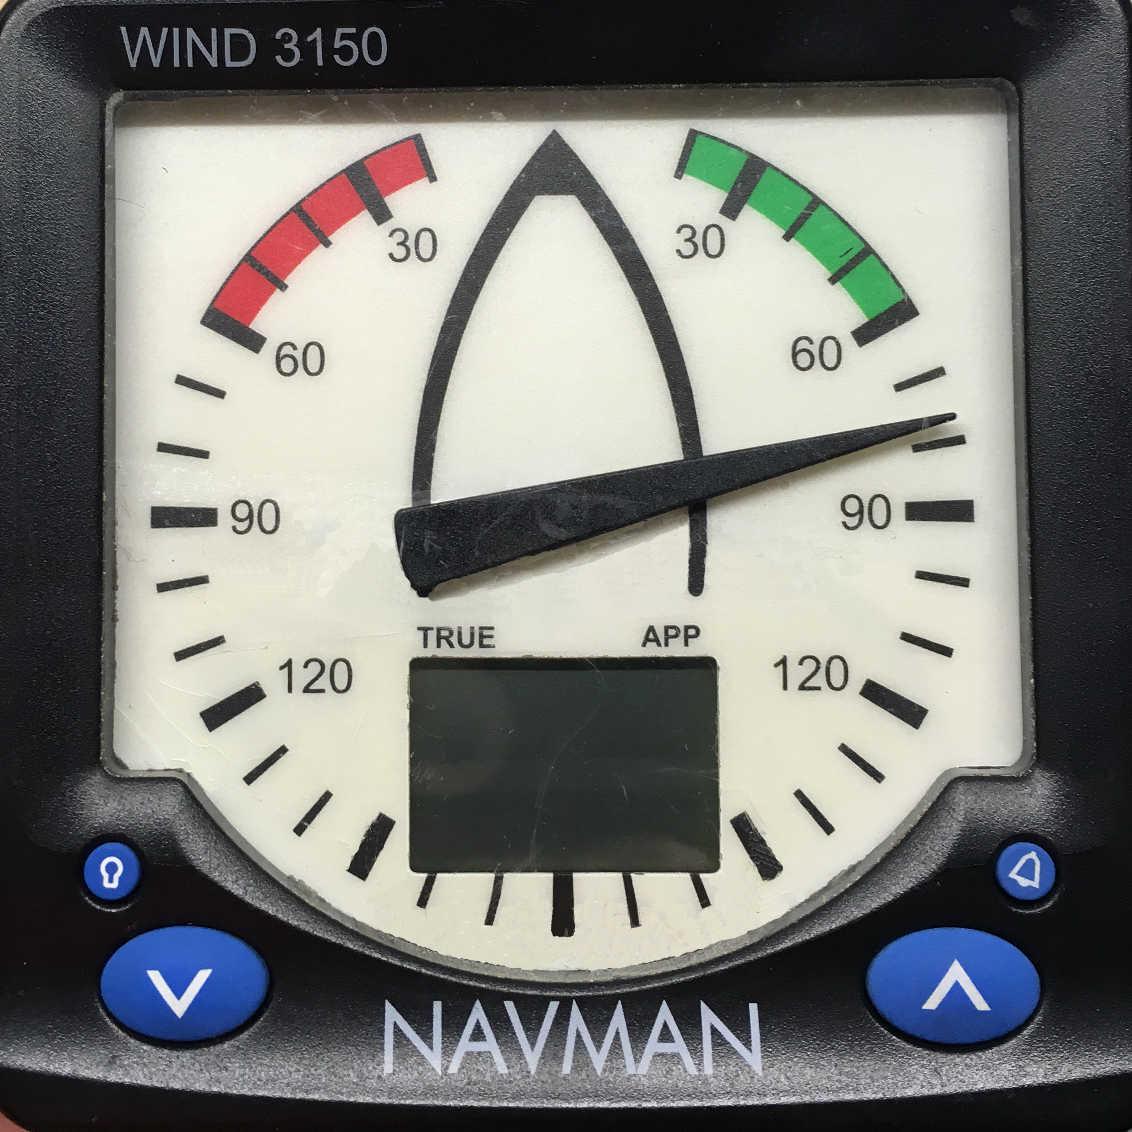 NAVMAN/NAVSTAR 3100 Display Not Working